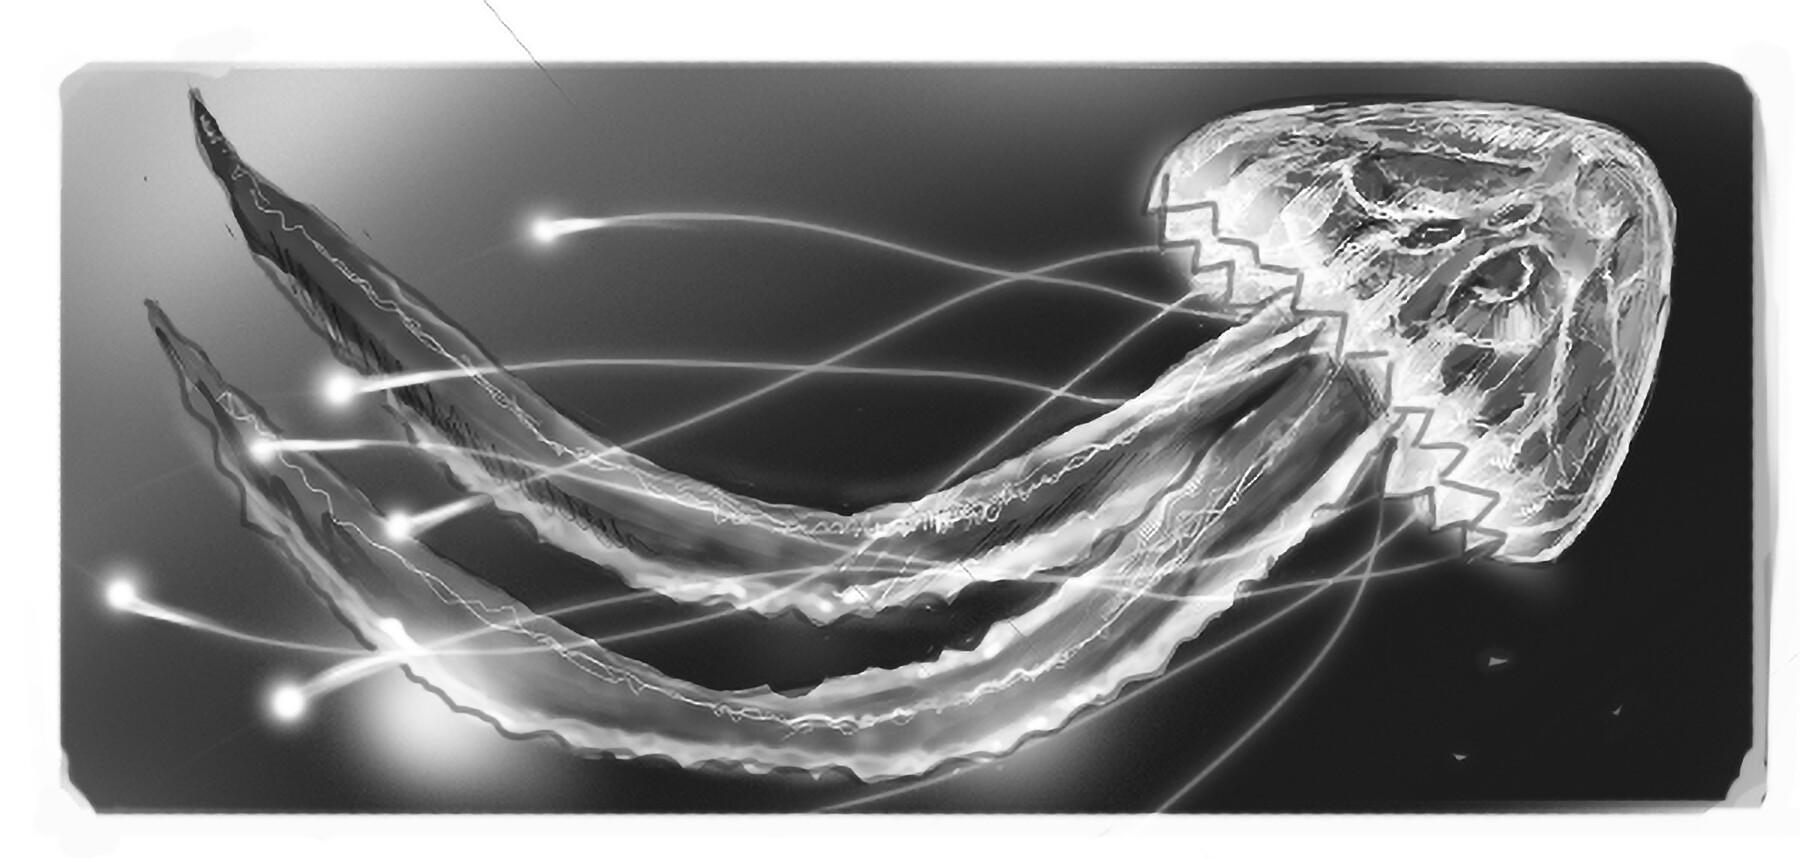 Fatih gurdal jfish